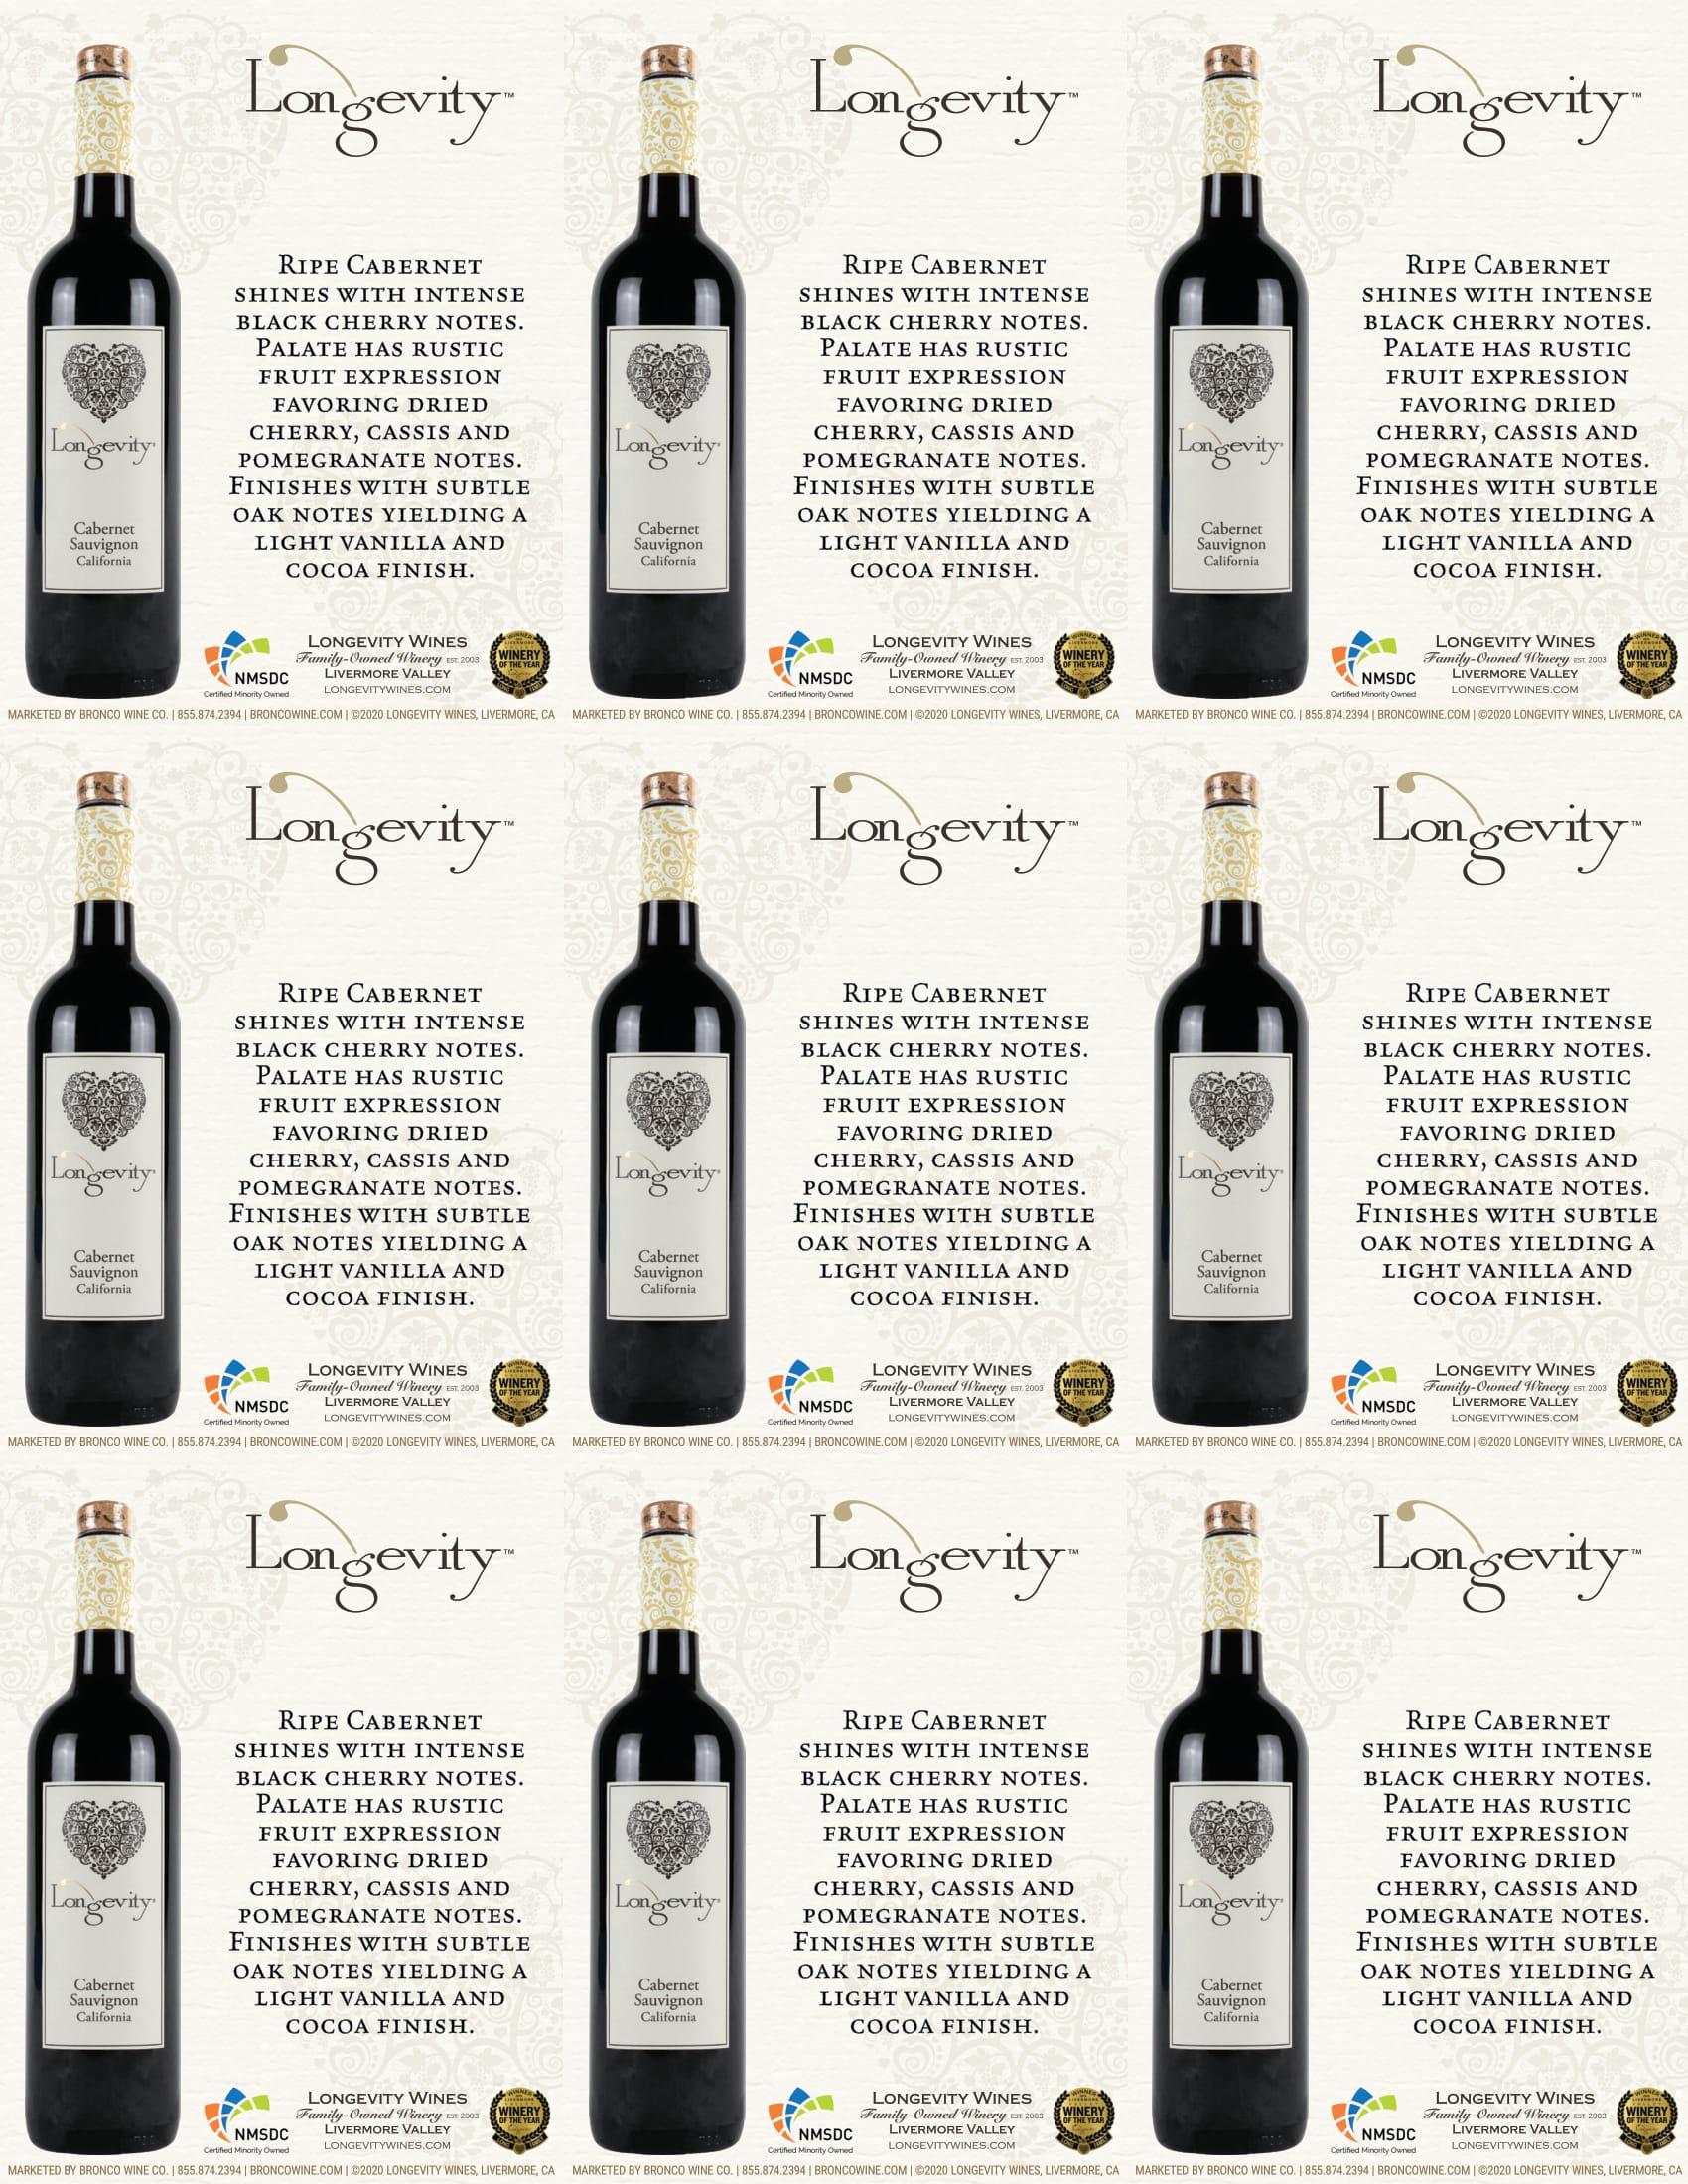 Longevity Cabernet Sauvignon Shelf Talkers